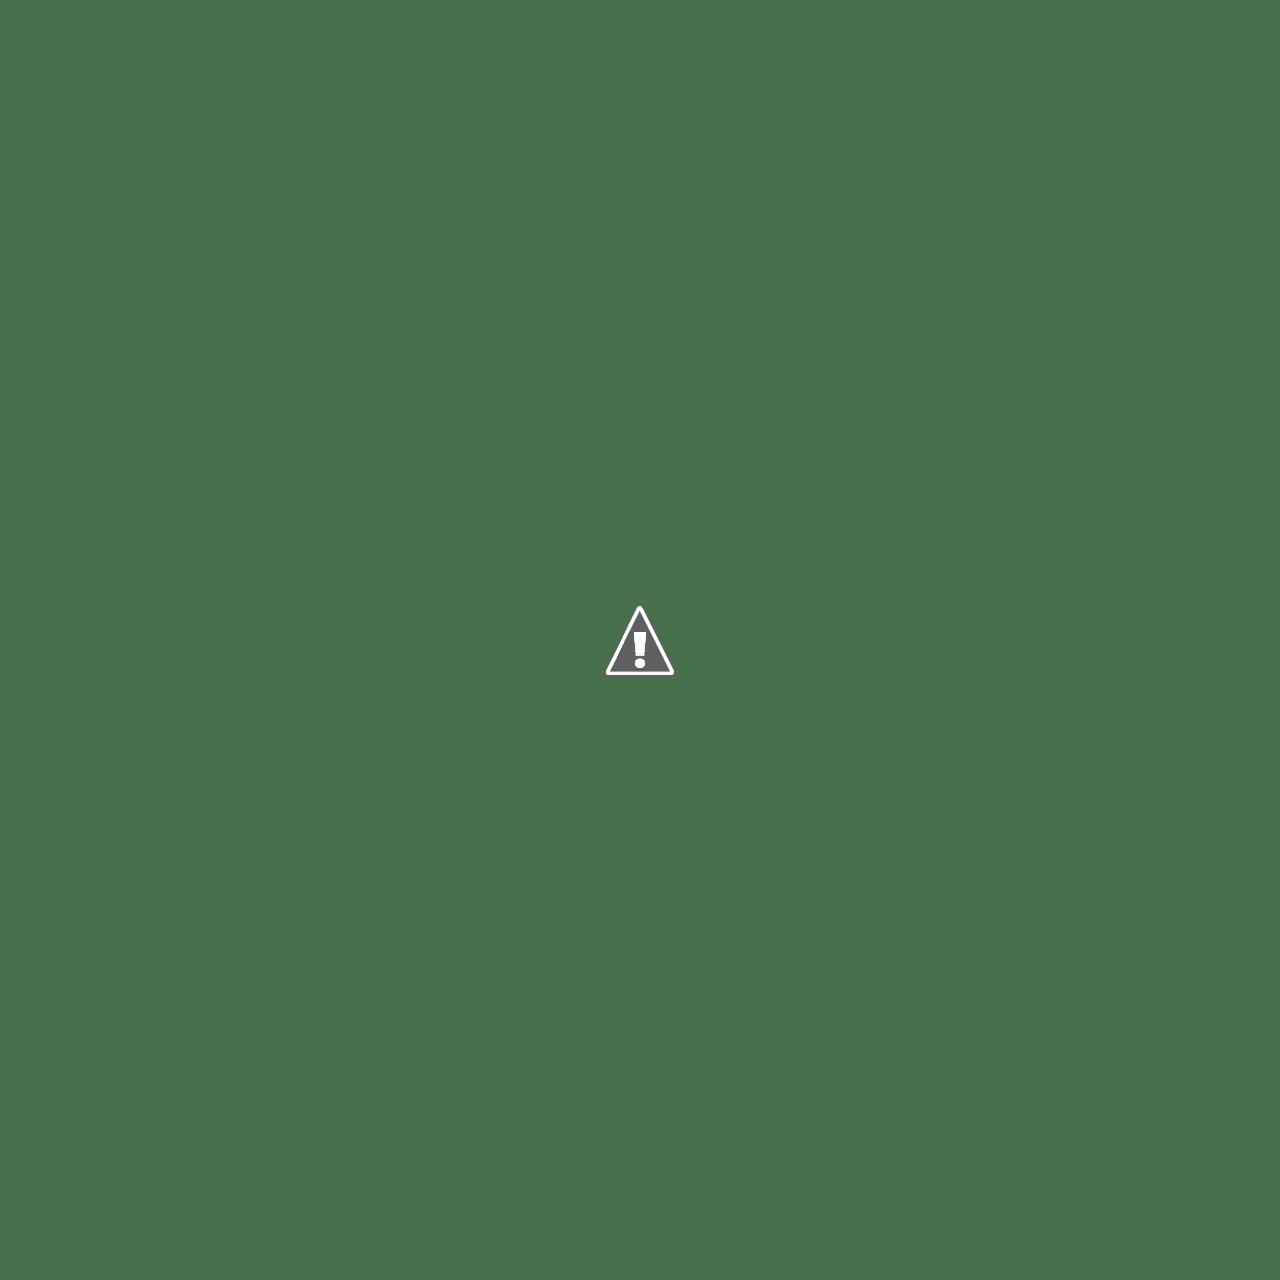 Bürotime Office Furniture - A leading office furniture ...